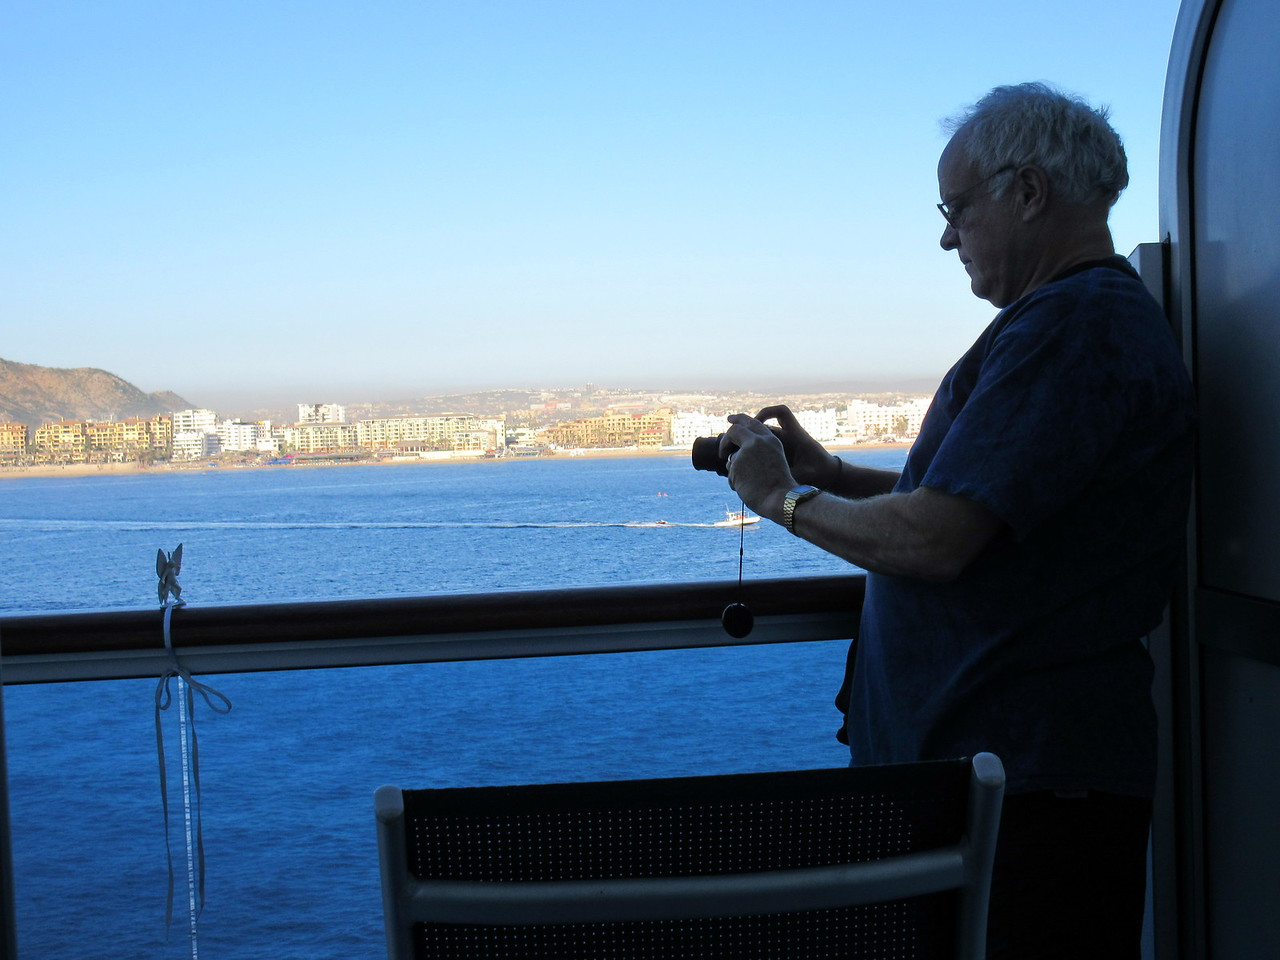 2014-12-11 Cabo San Lucas behind the scene, Arthur photographing Arthur